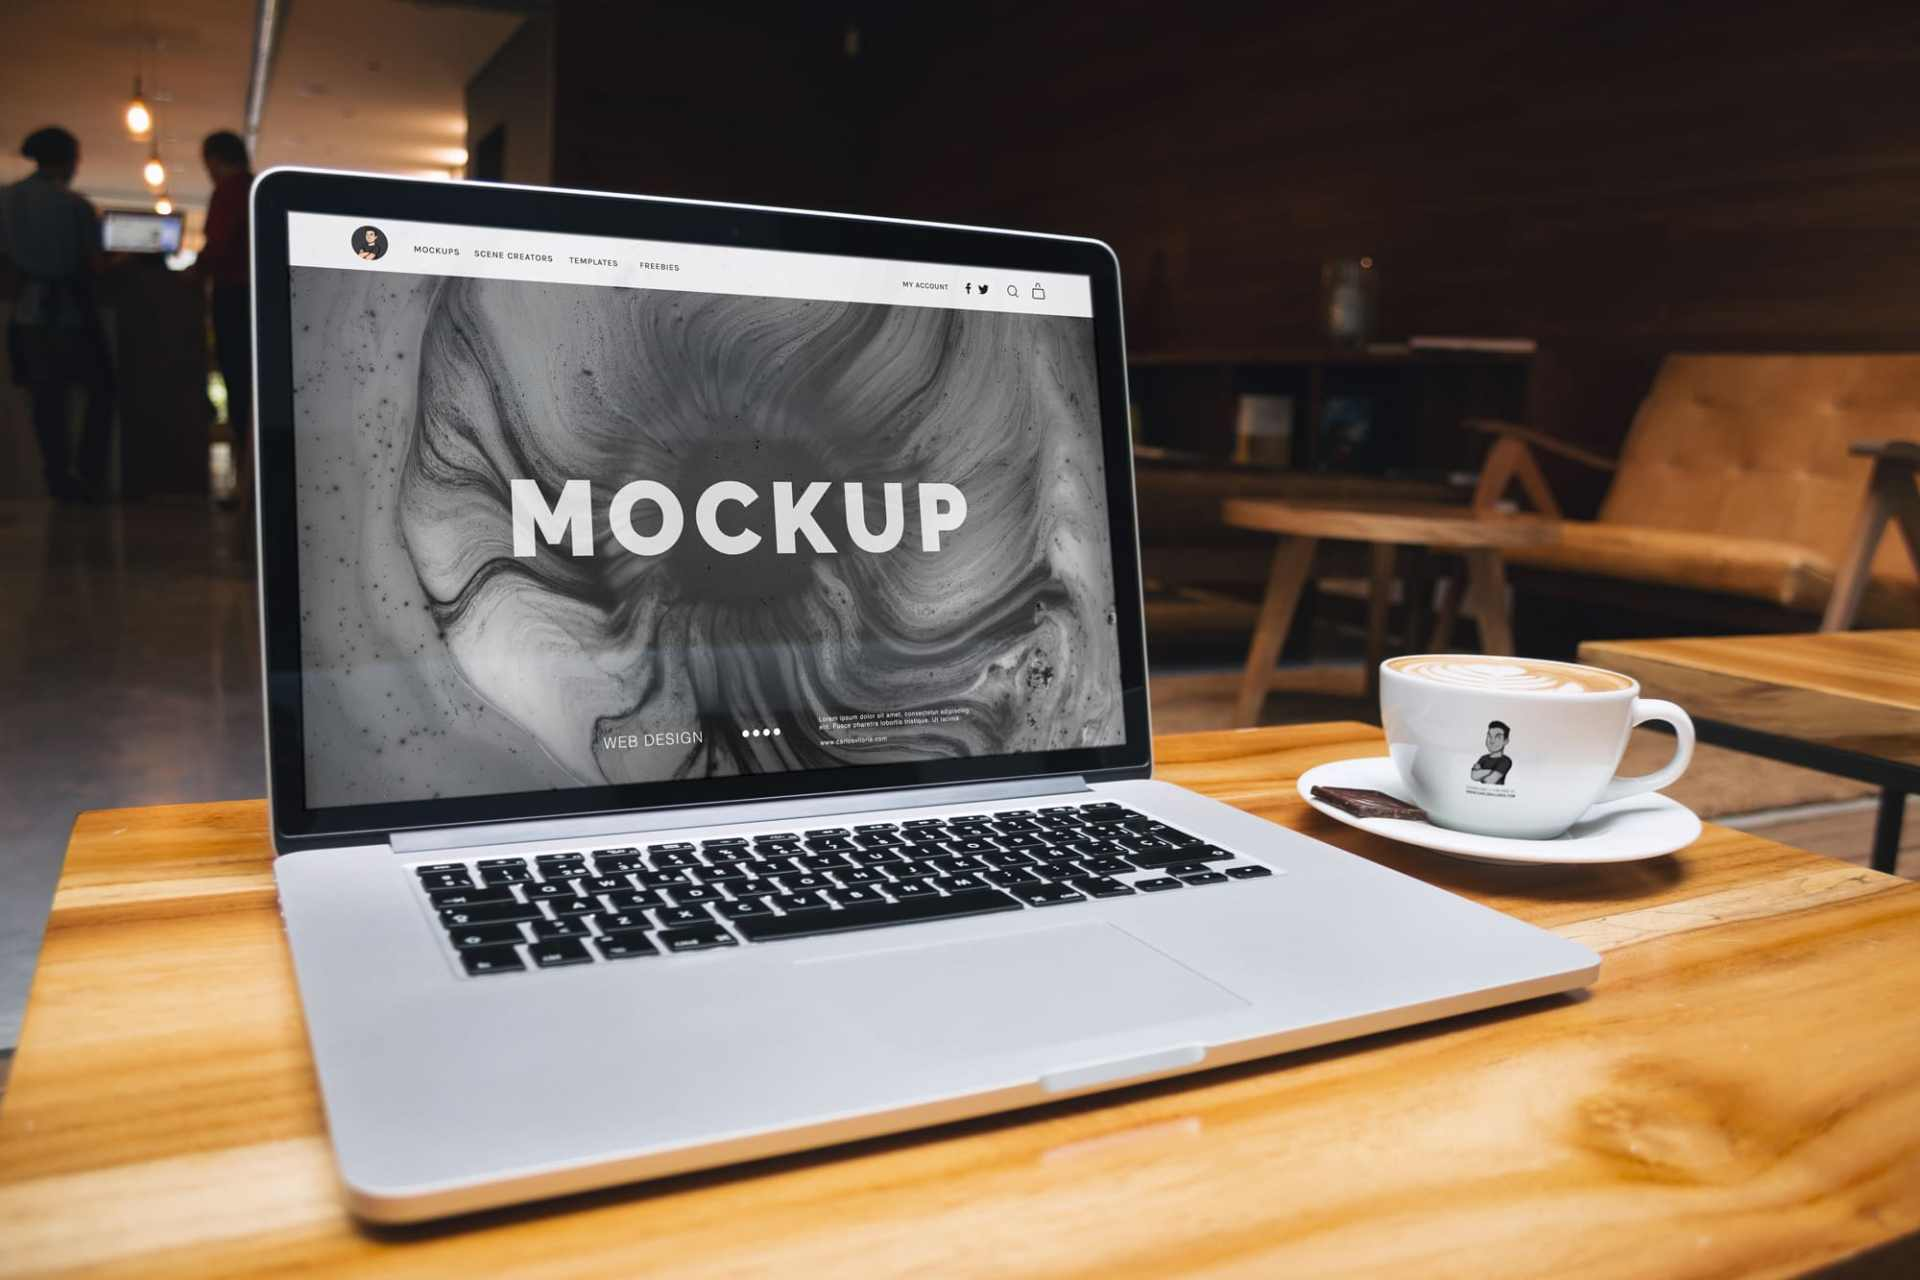 Free Mockup: Macbook Pro Retina and Coffee Cup